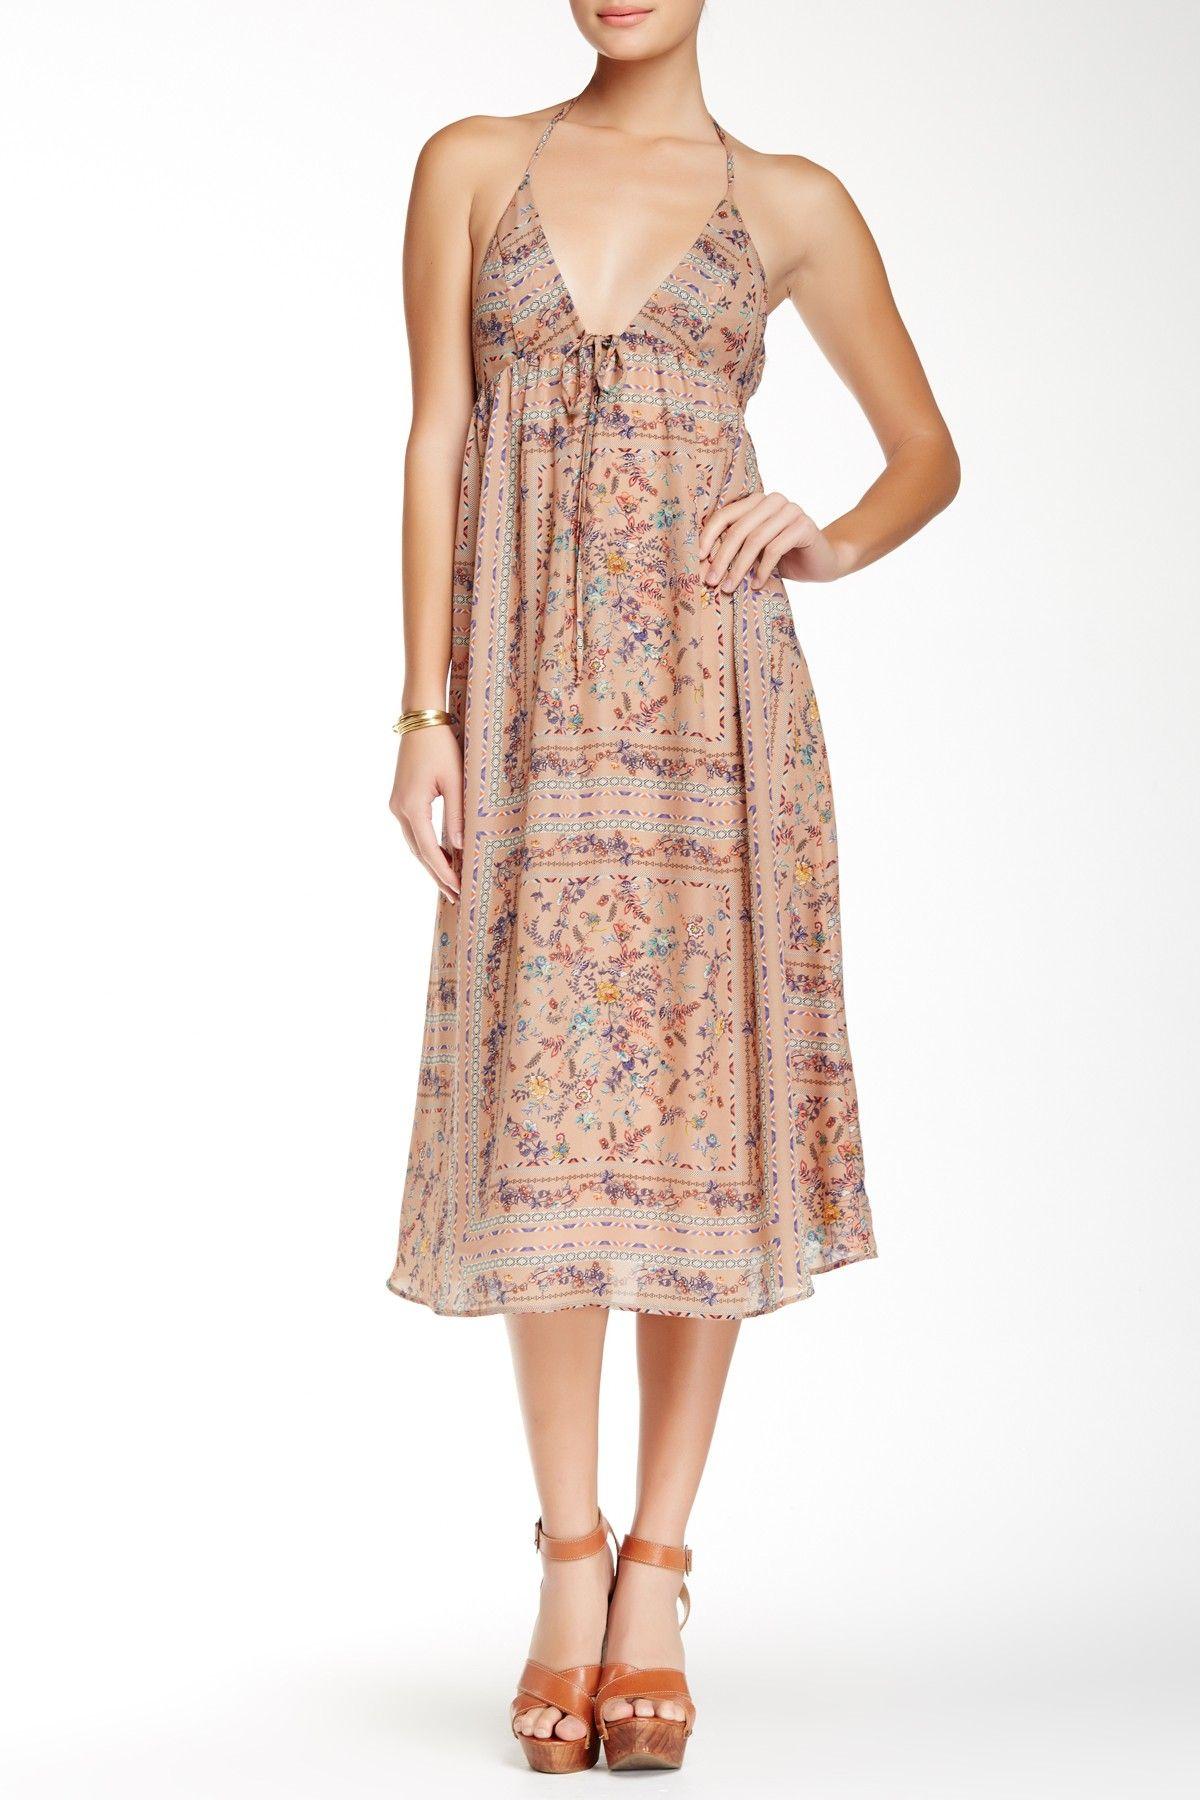 Lily White Printed Halter Dress Juniors Nordstrom Rack Printed Halter Dress Junior Dresses Sundress Dress [ 1800 x 1200 Pixel ]